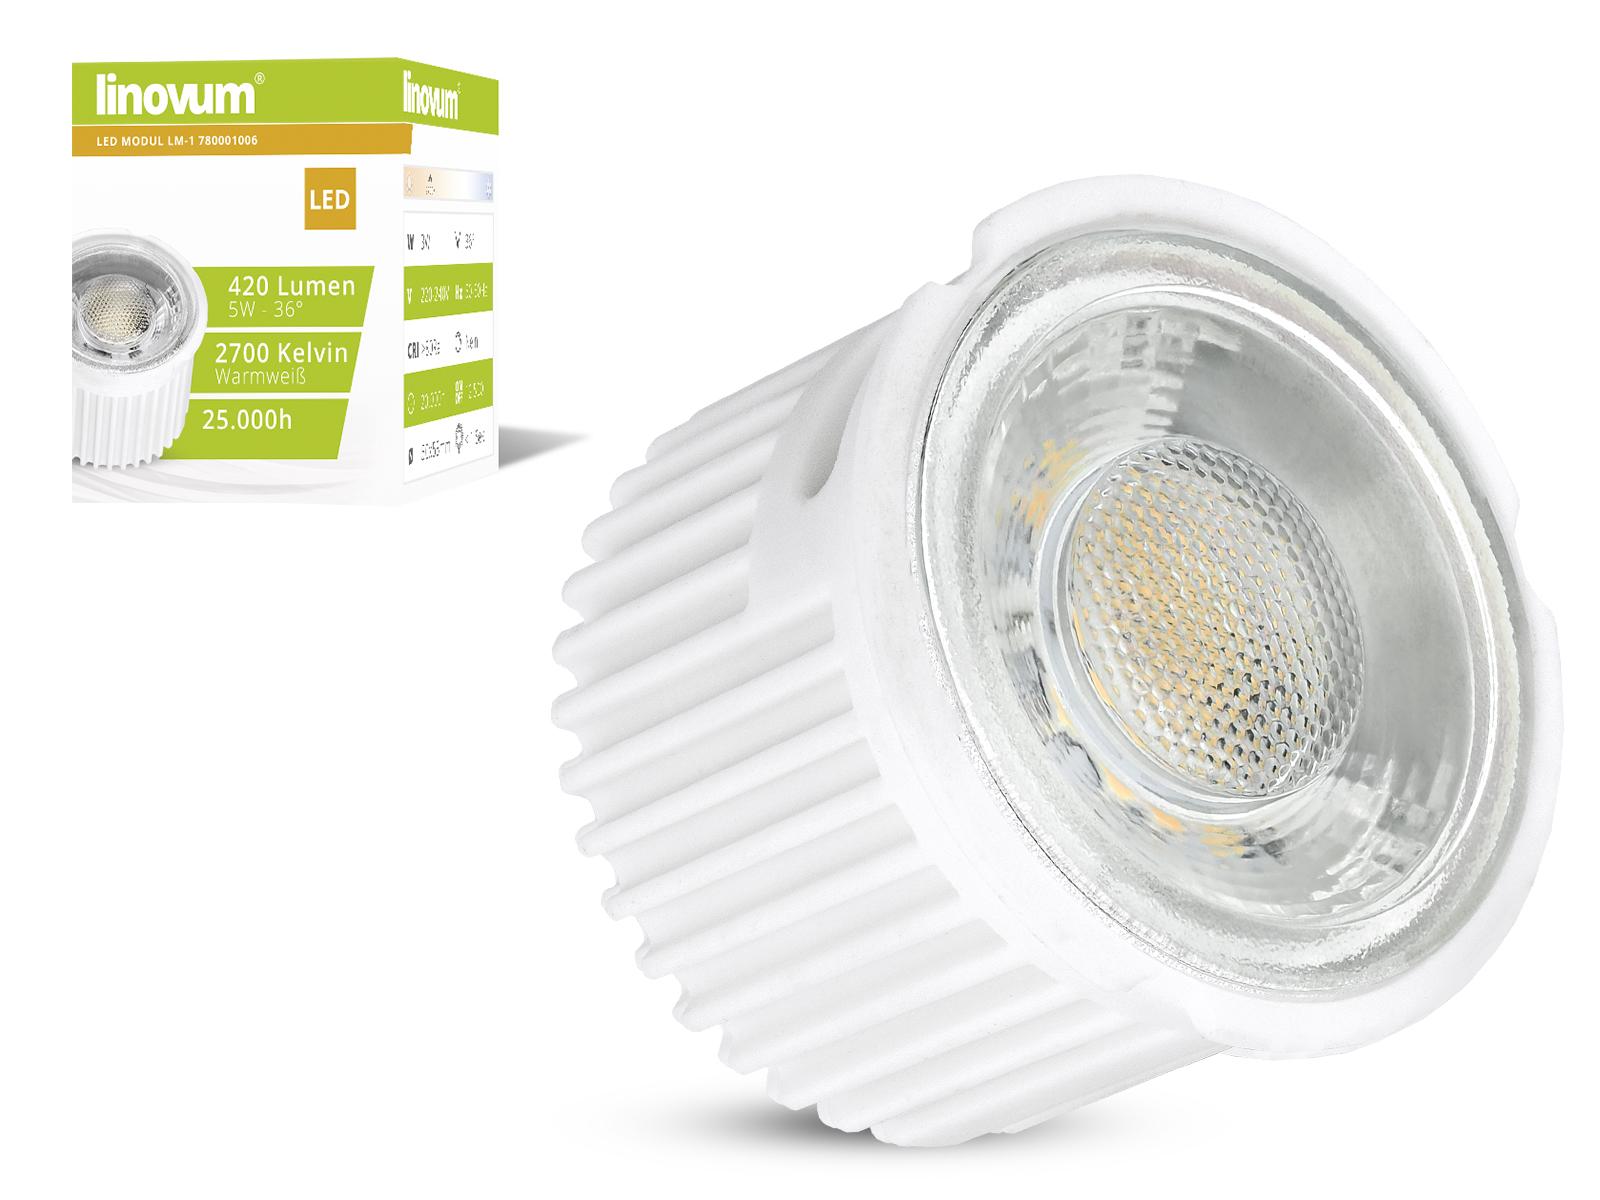 linovum 5w led mcob modul f r 230v 2700k warm wei 420 lumen ebay. Black Bedroom Furniture Sets. Home Design Ideas